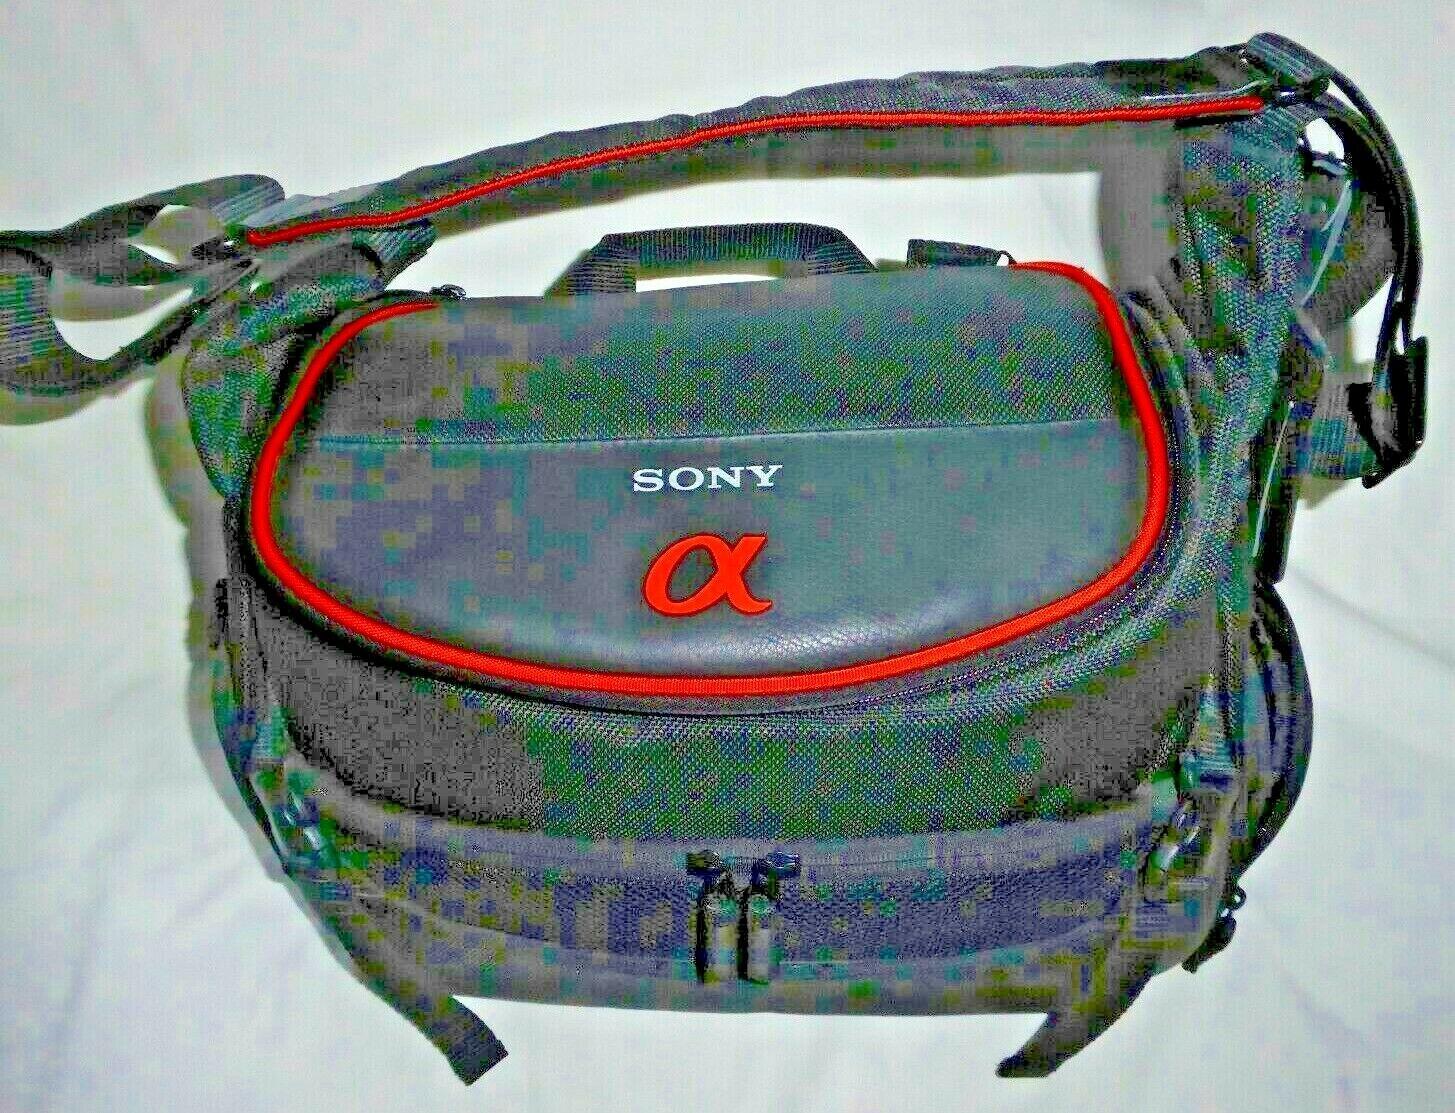 Sony LCS-AMSC30 Gadget Bag Shoulder Bag